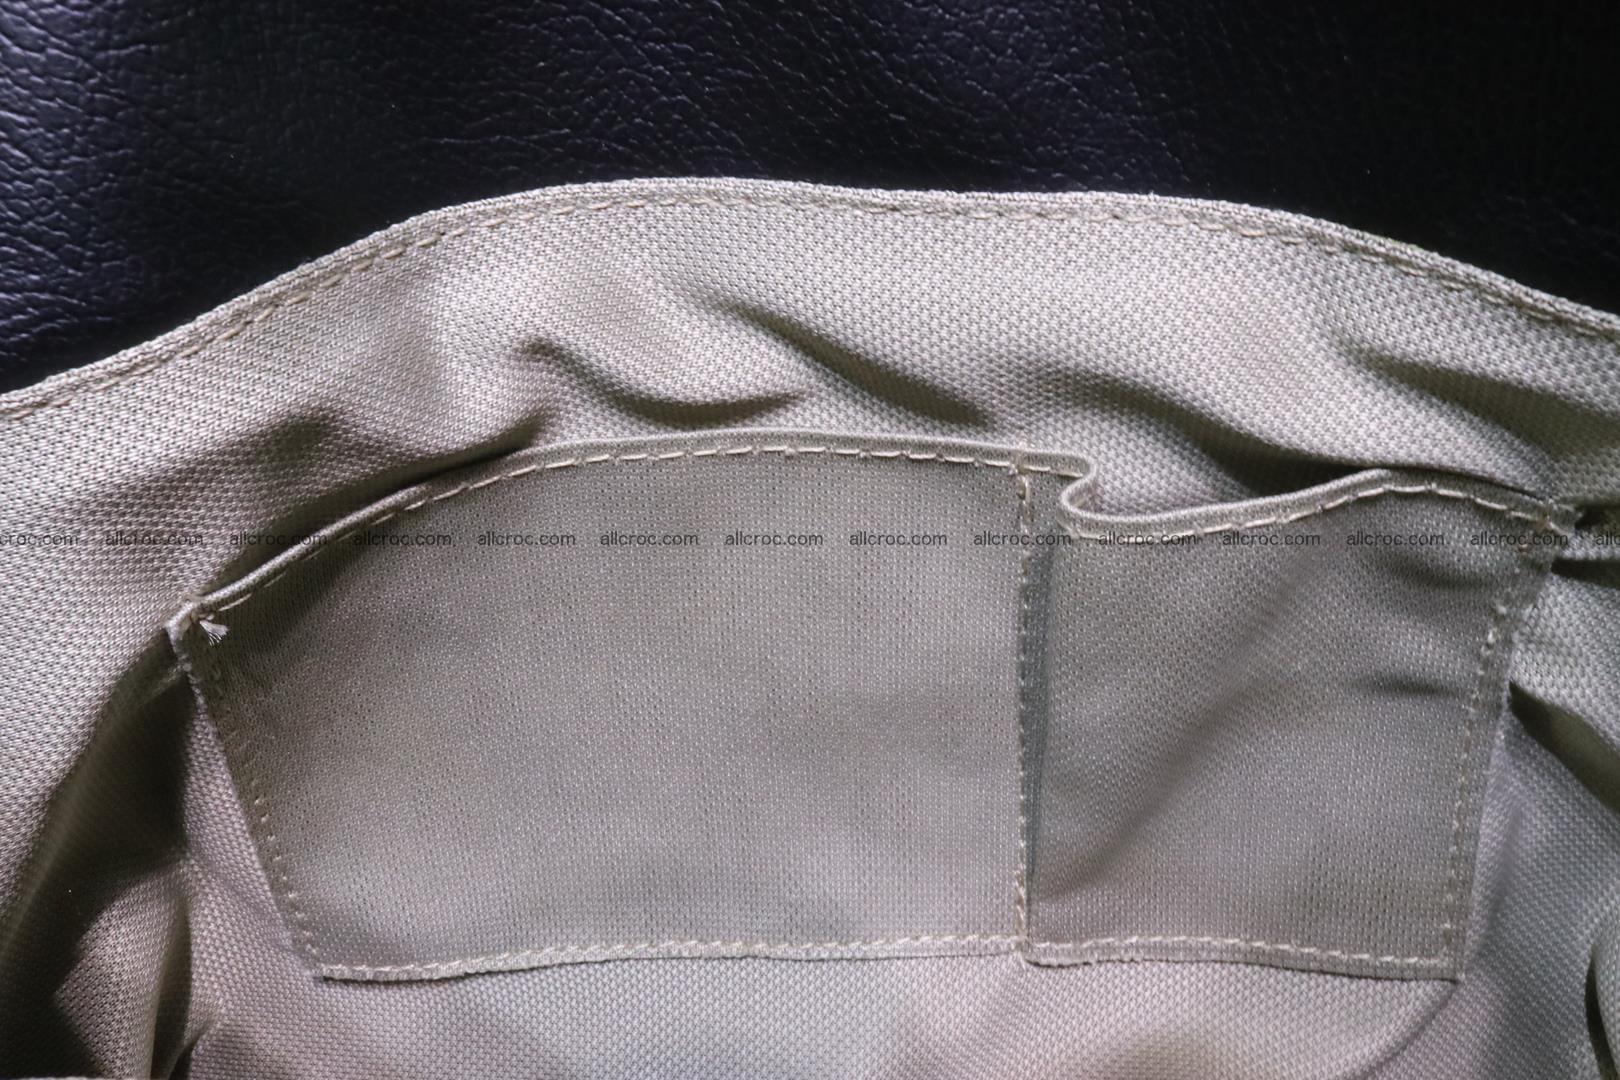 Handbag for lady from cobra skin with cobra head 189 Foto 13